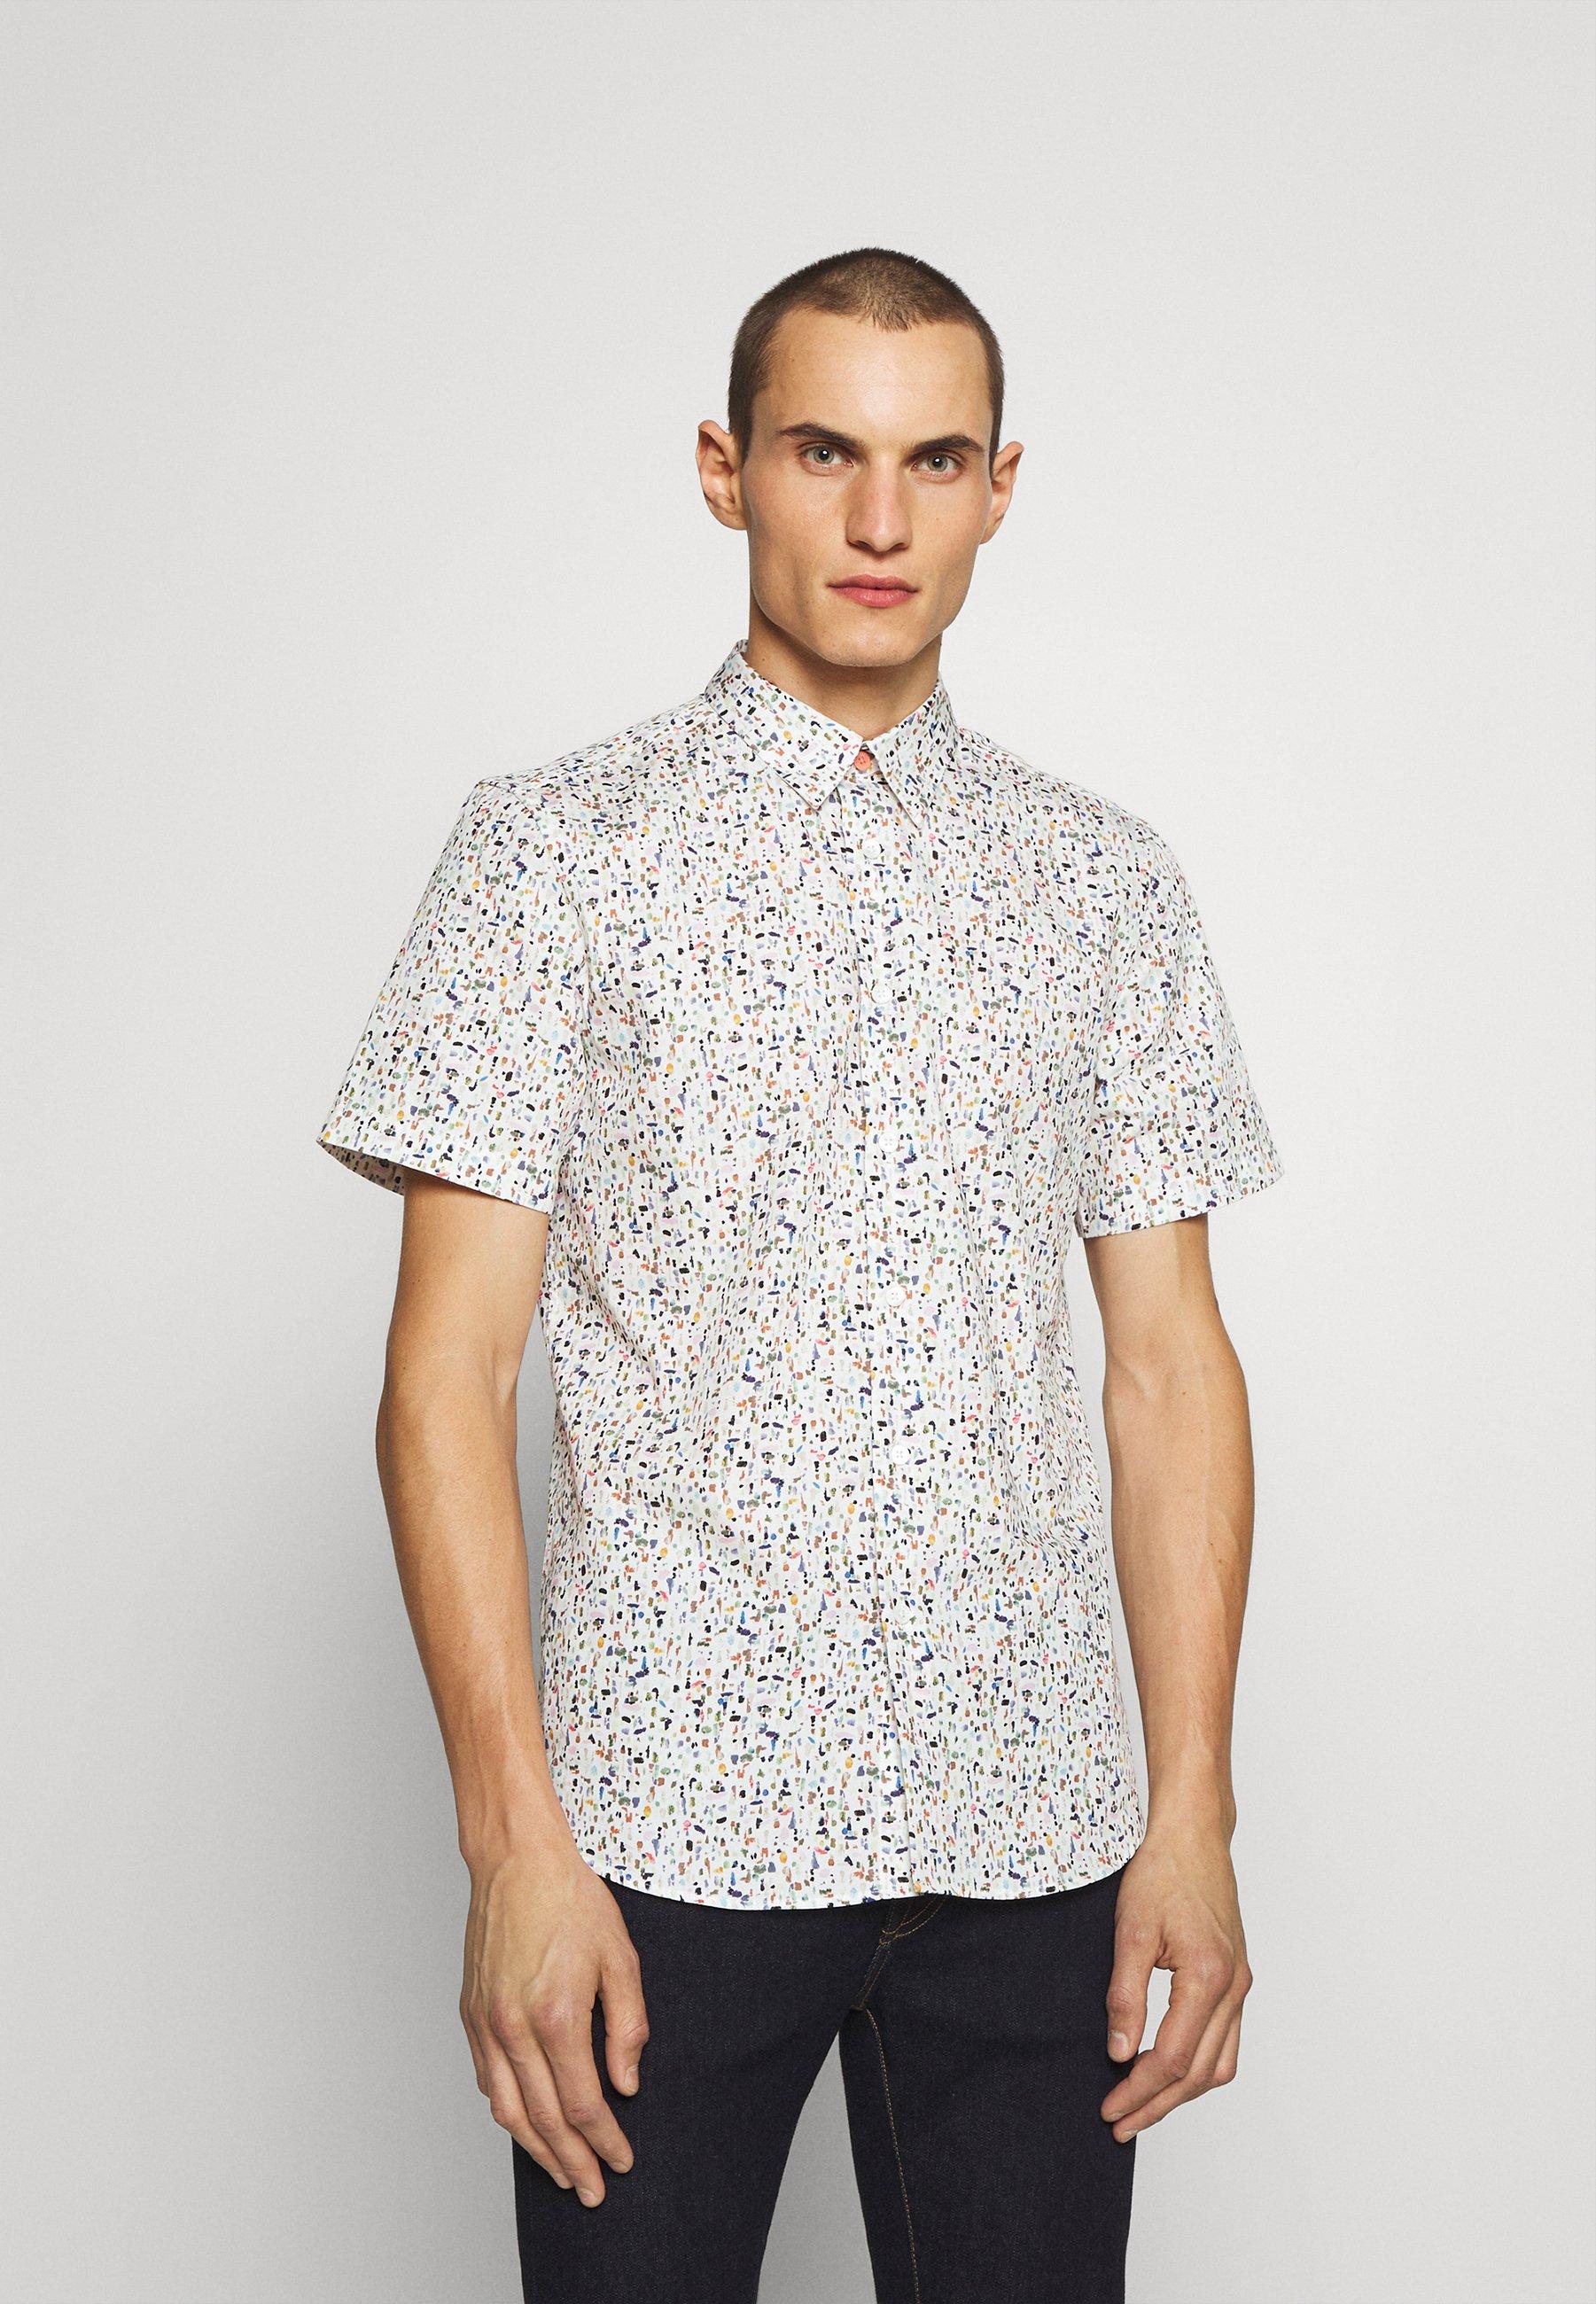 Uomo SHIRT TAILORED  - Camicia